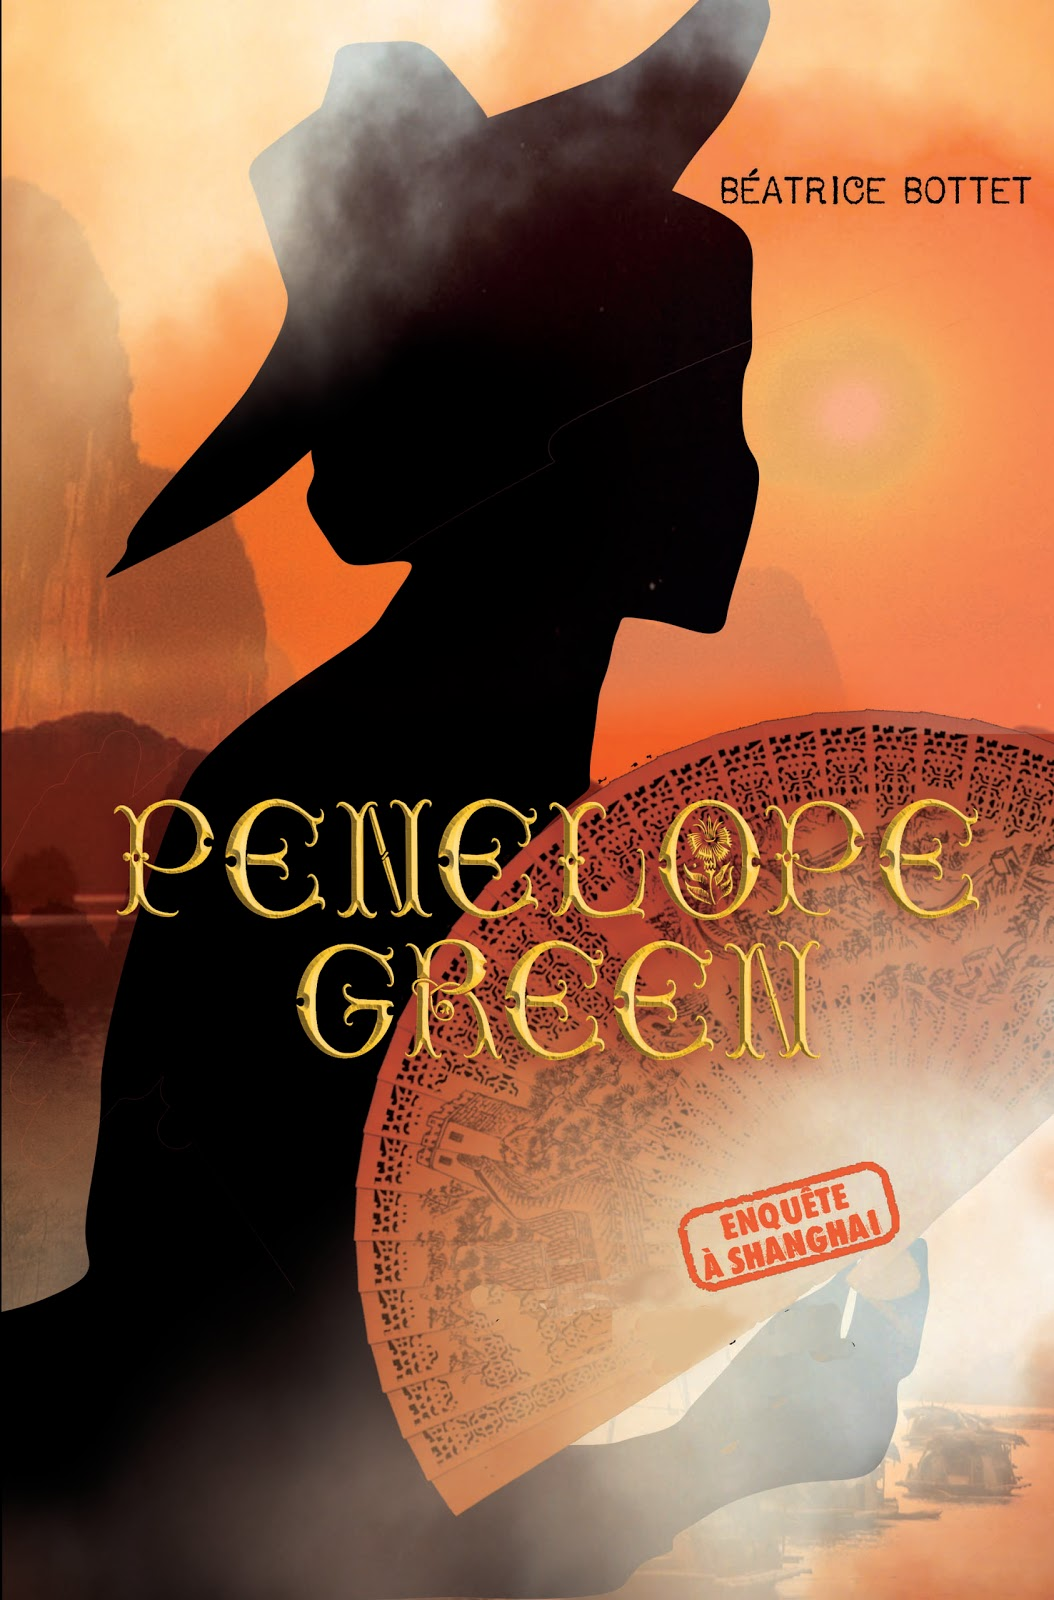 http://1.bp.blogspot.com/-NfjLNvd0Fws/UABJgHX26cI/AAAAAAAABZo/MbpeTdBJNEY/s1600/Penelope+Green+-+T3+-+L--ventail+de+Madame+Li.jpg